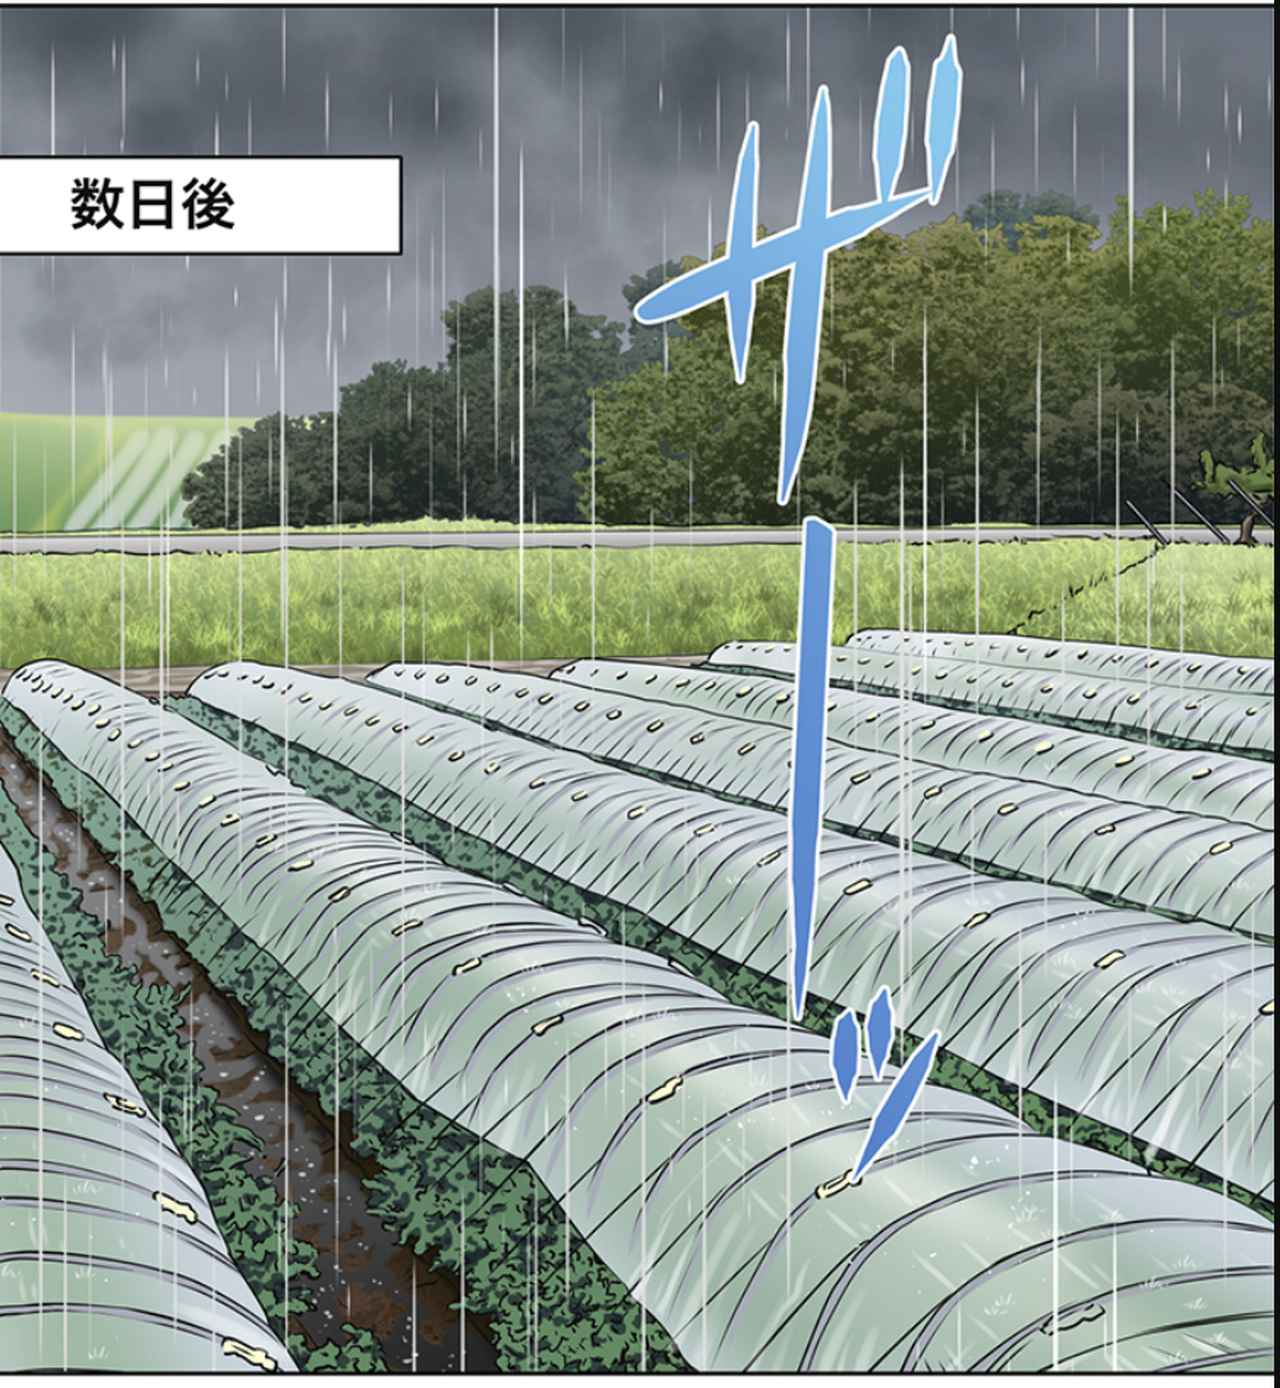 画像36: ja.honda-powerproducts.com